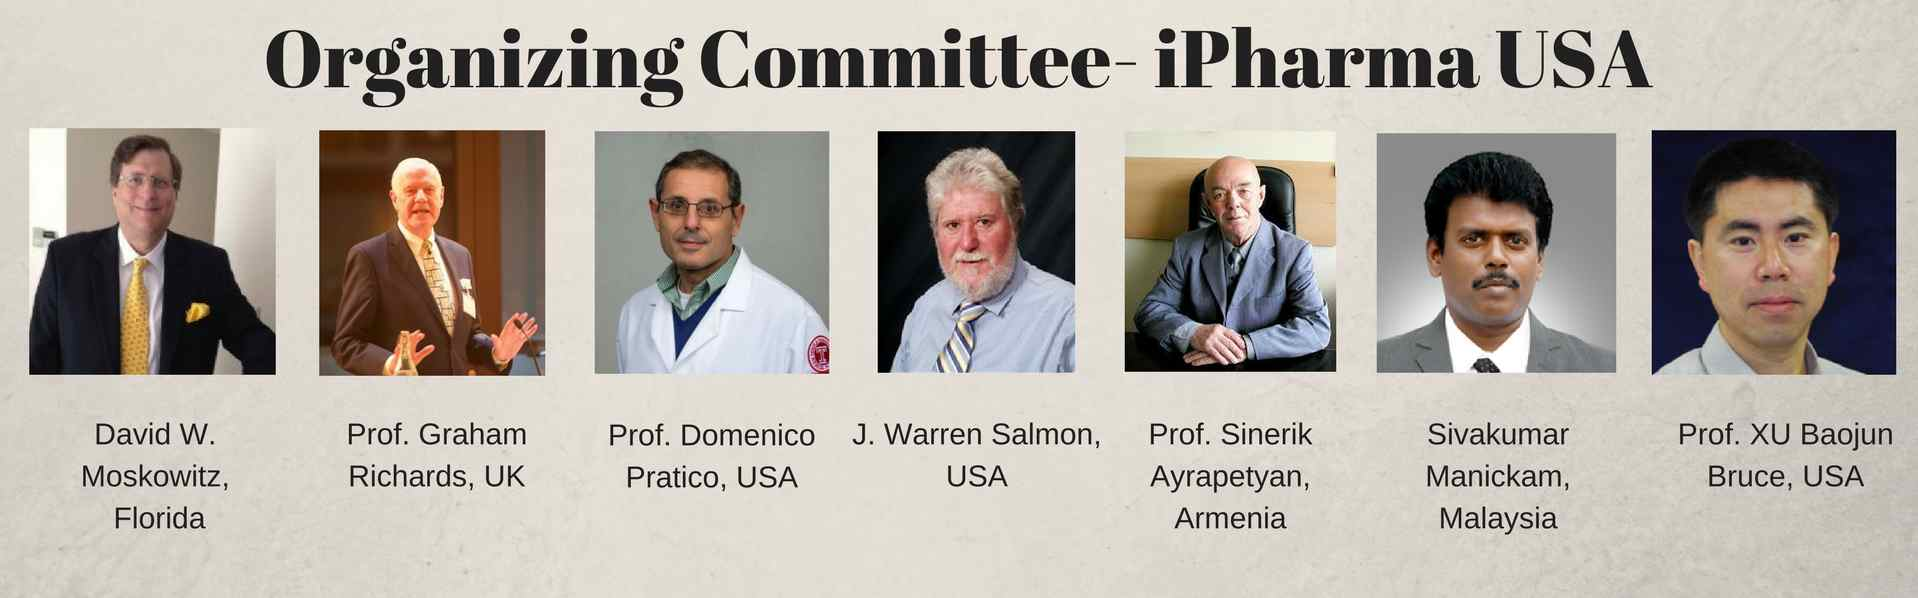 Organizing Committee_iPharma2017